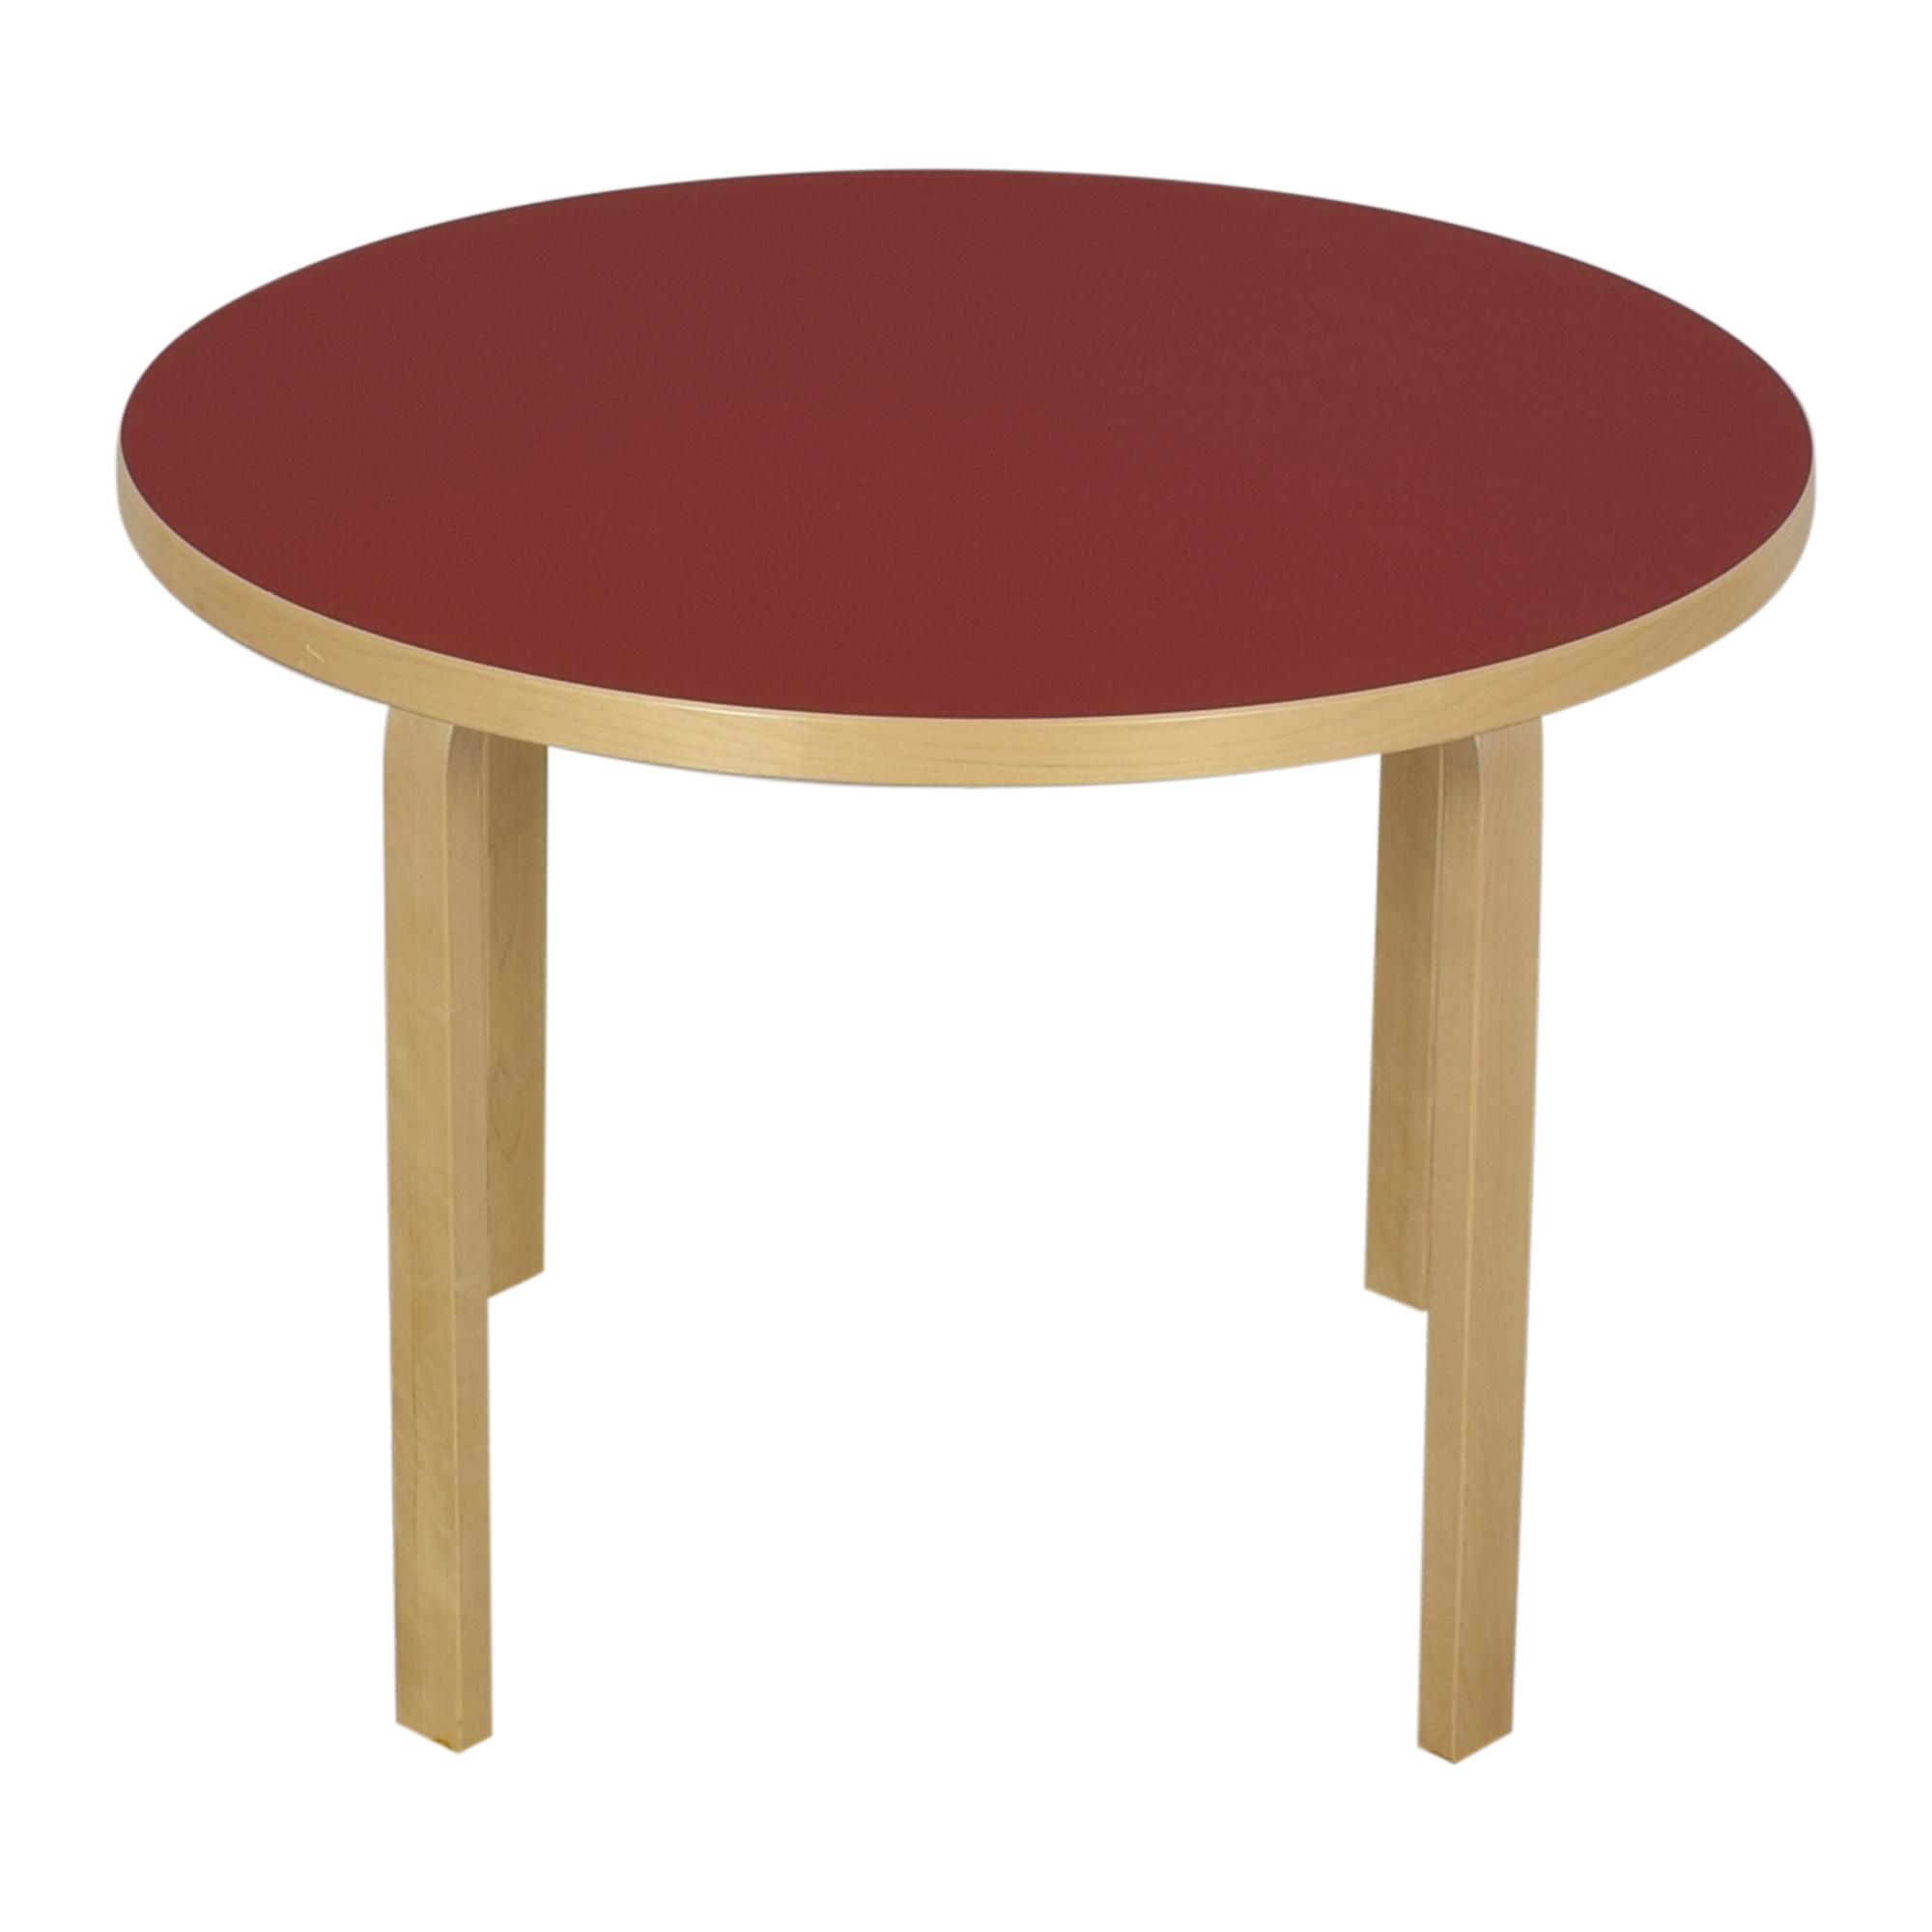 buy Artek Alvar Aalto Table 90a Artek